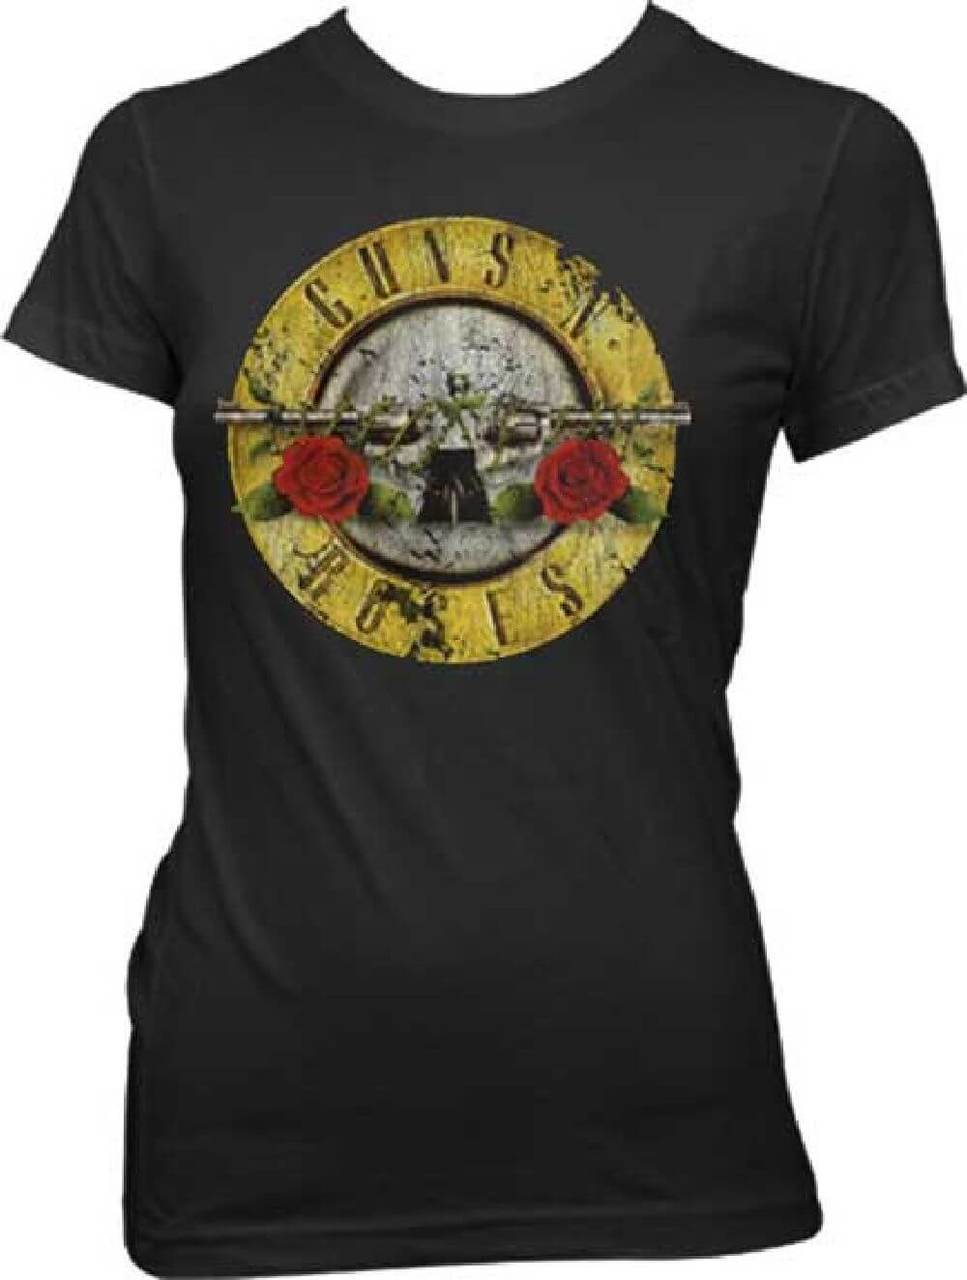 Womens vintage rock t shirts